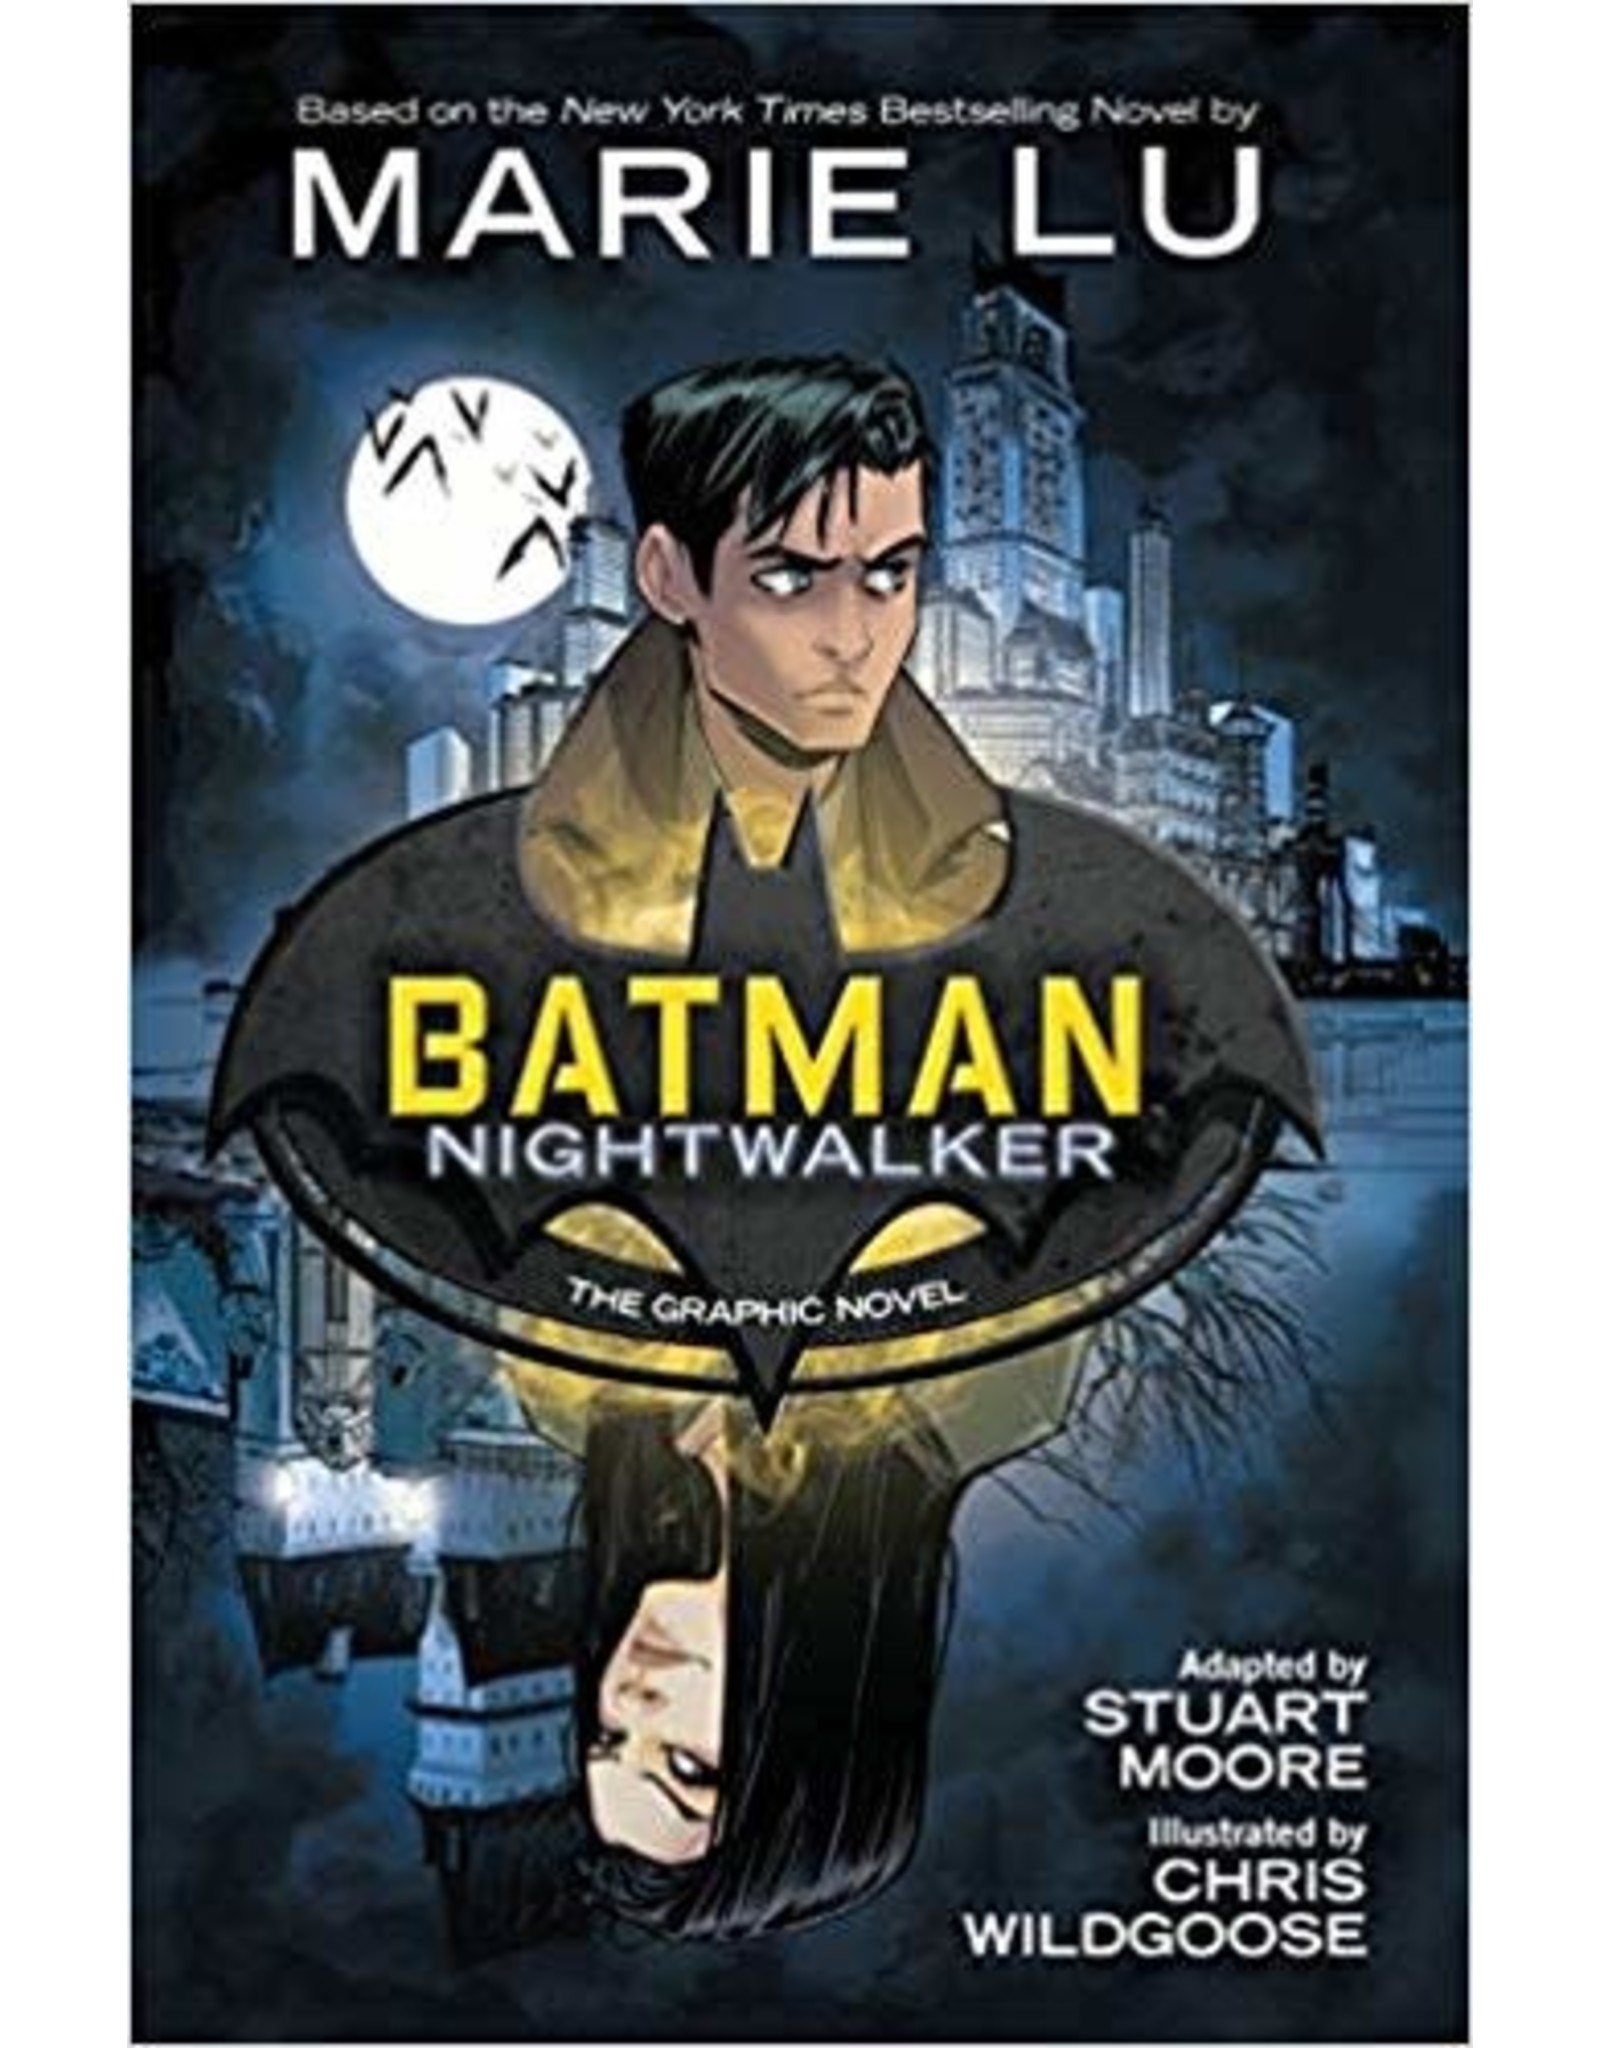 DC COMICS BATMAN NIGHTWALKER THE GRAPHIC NOVEL DC INK